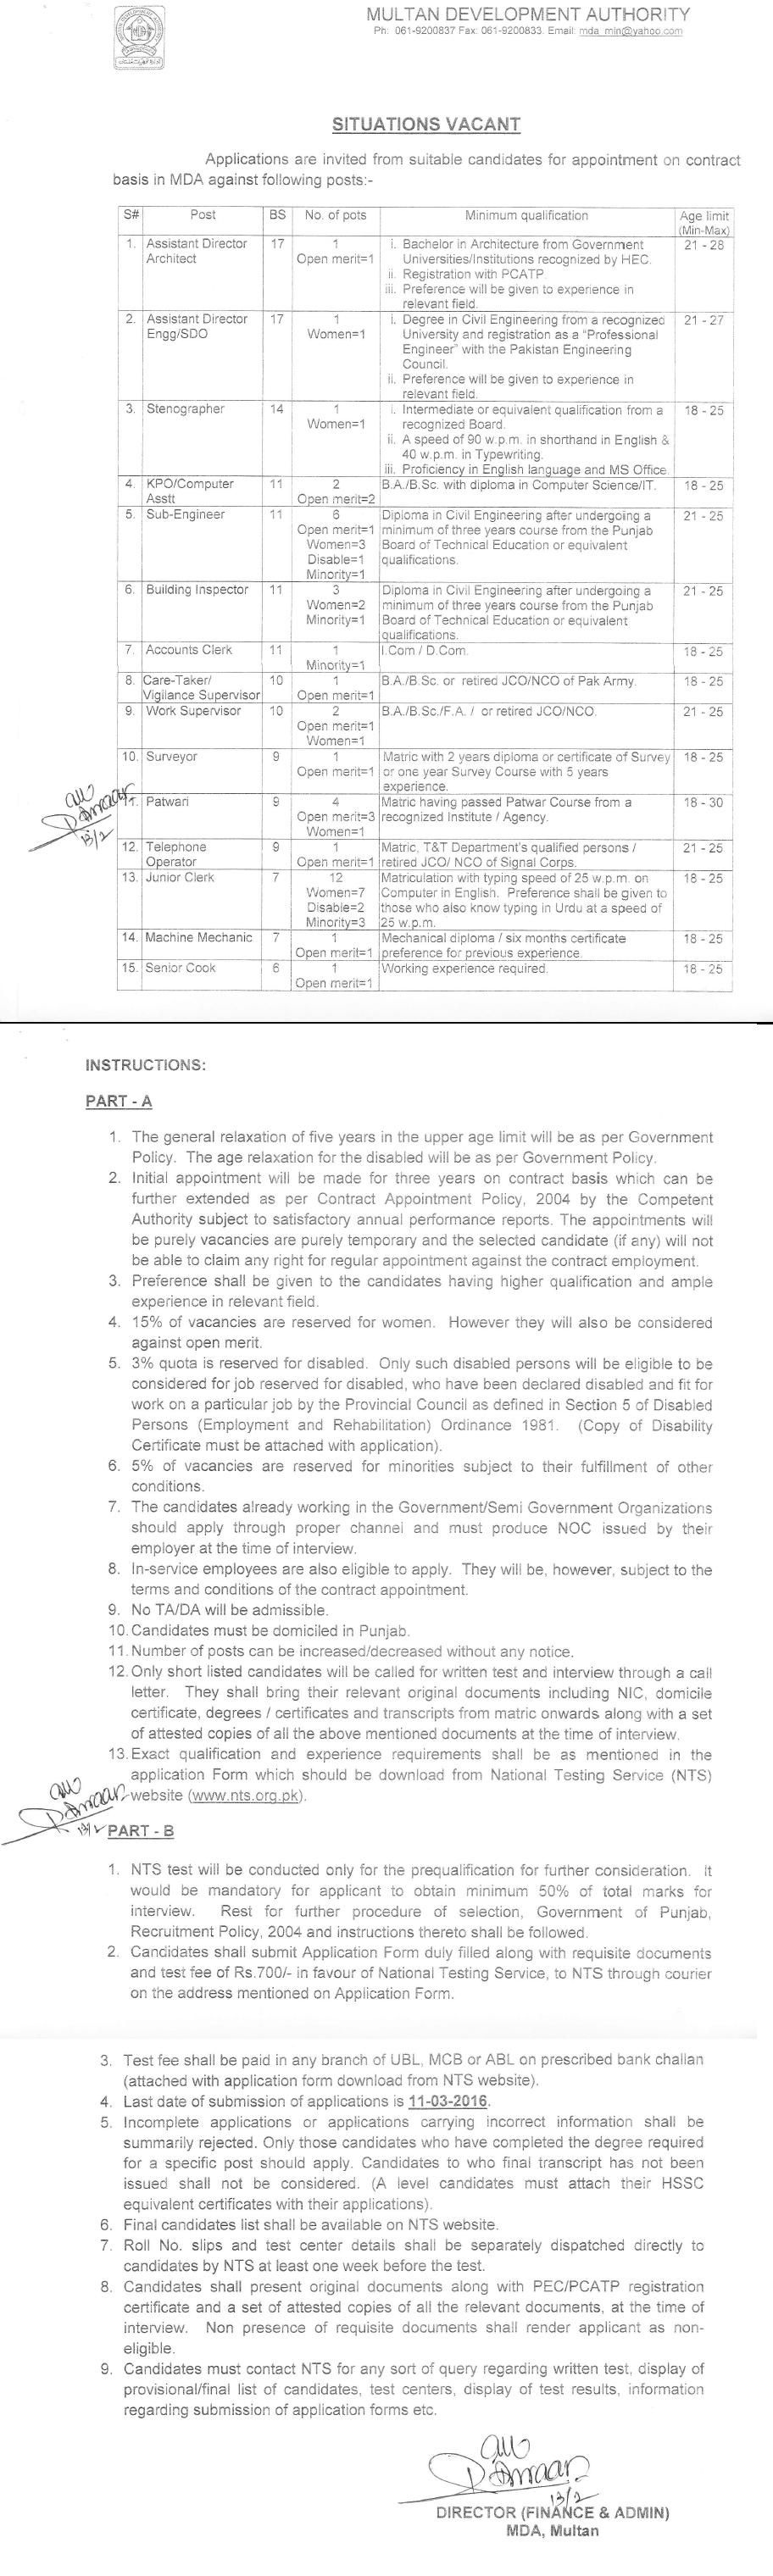 Multan Development Authority MDA Jobs 2016 NTS Application Form Last Date